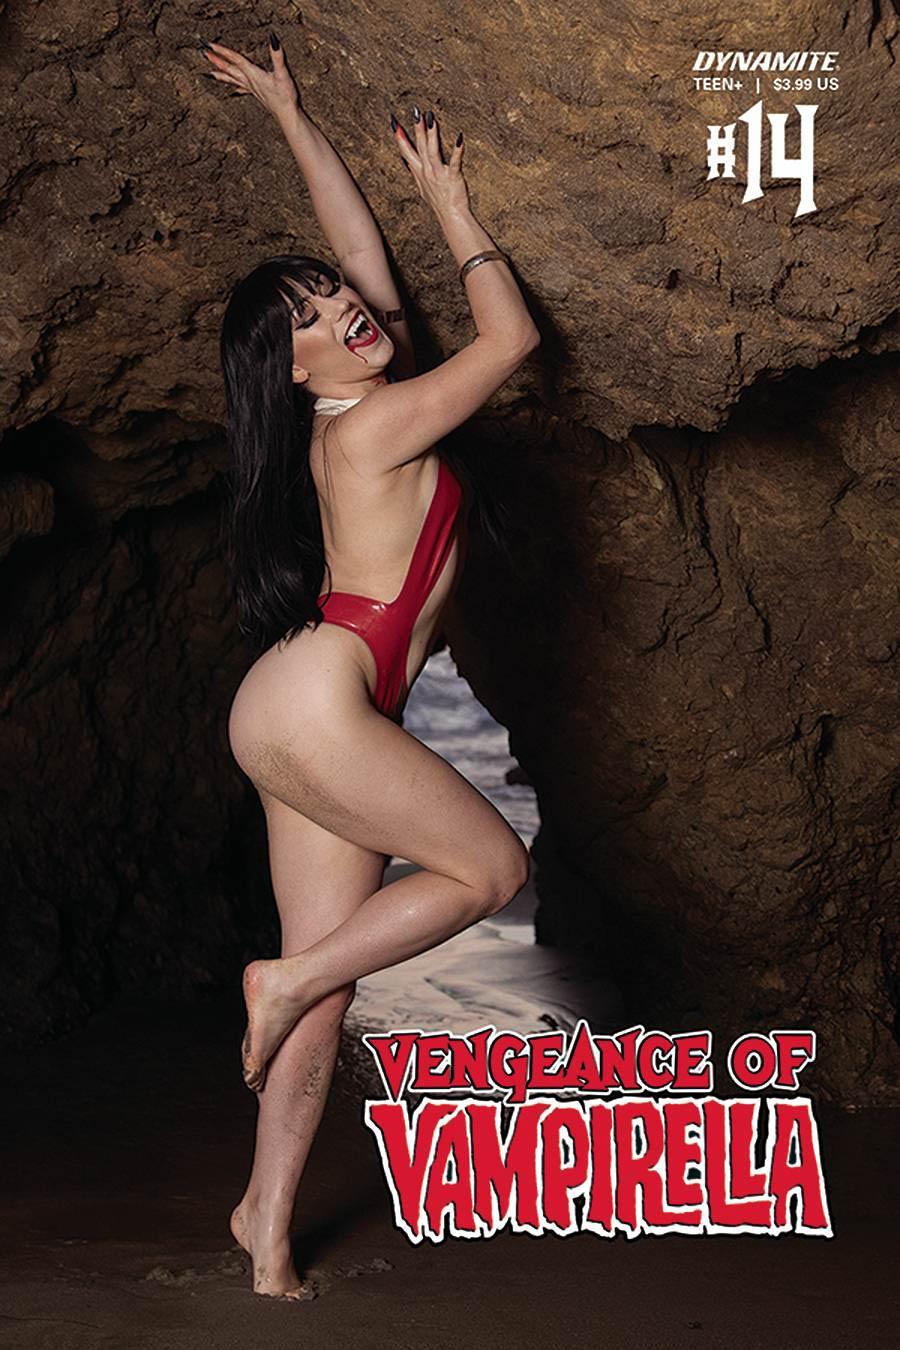 Vengeance Of Vampirella Vol 2 #14 Cover D Variant Rachel Hollon Cosplay Photo Cover